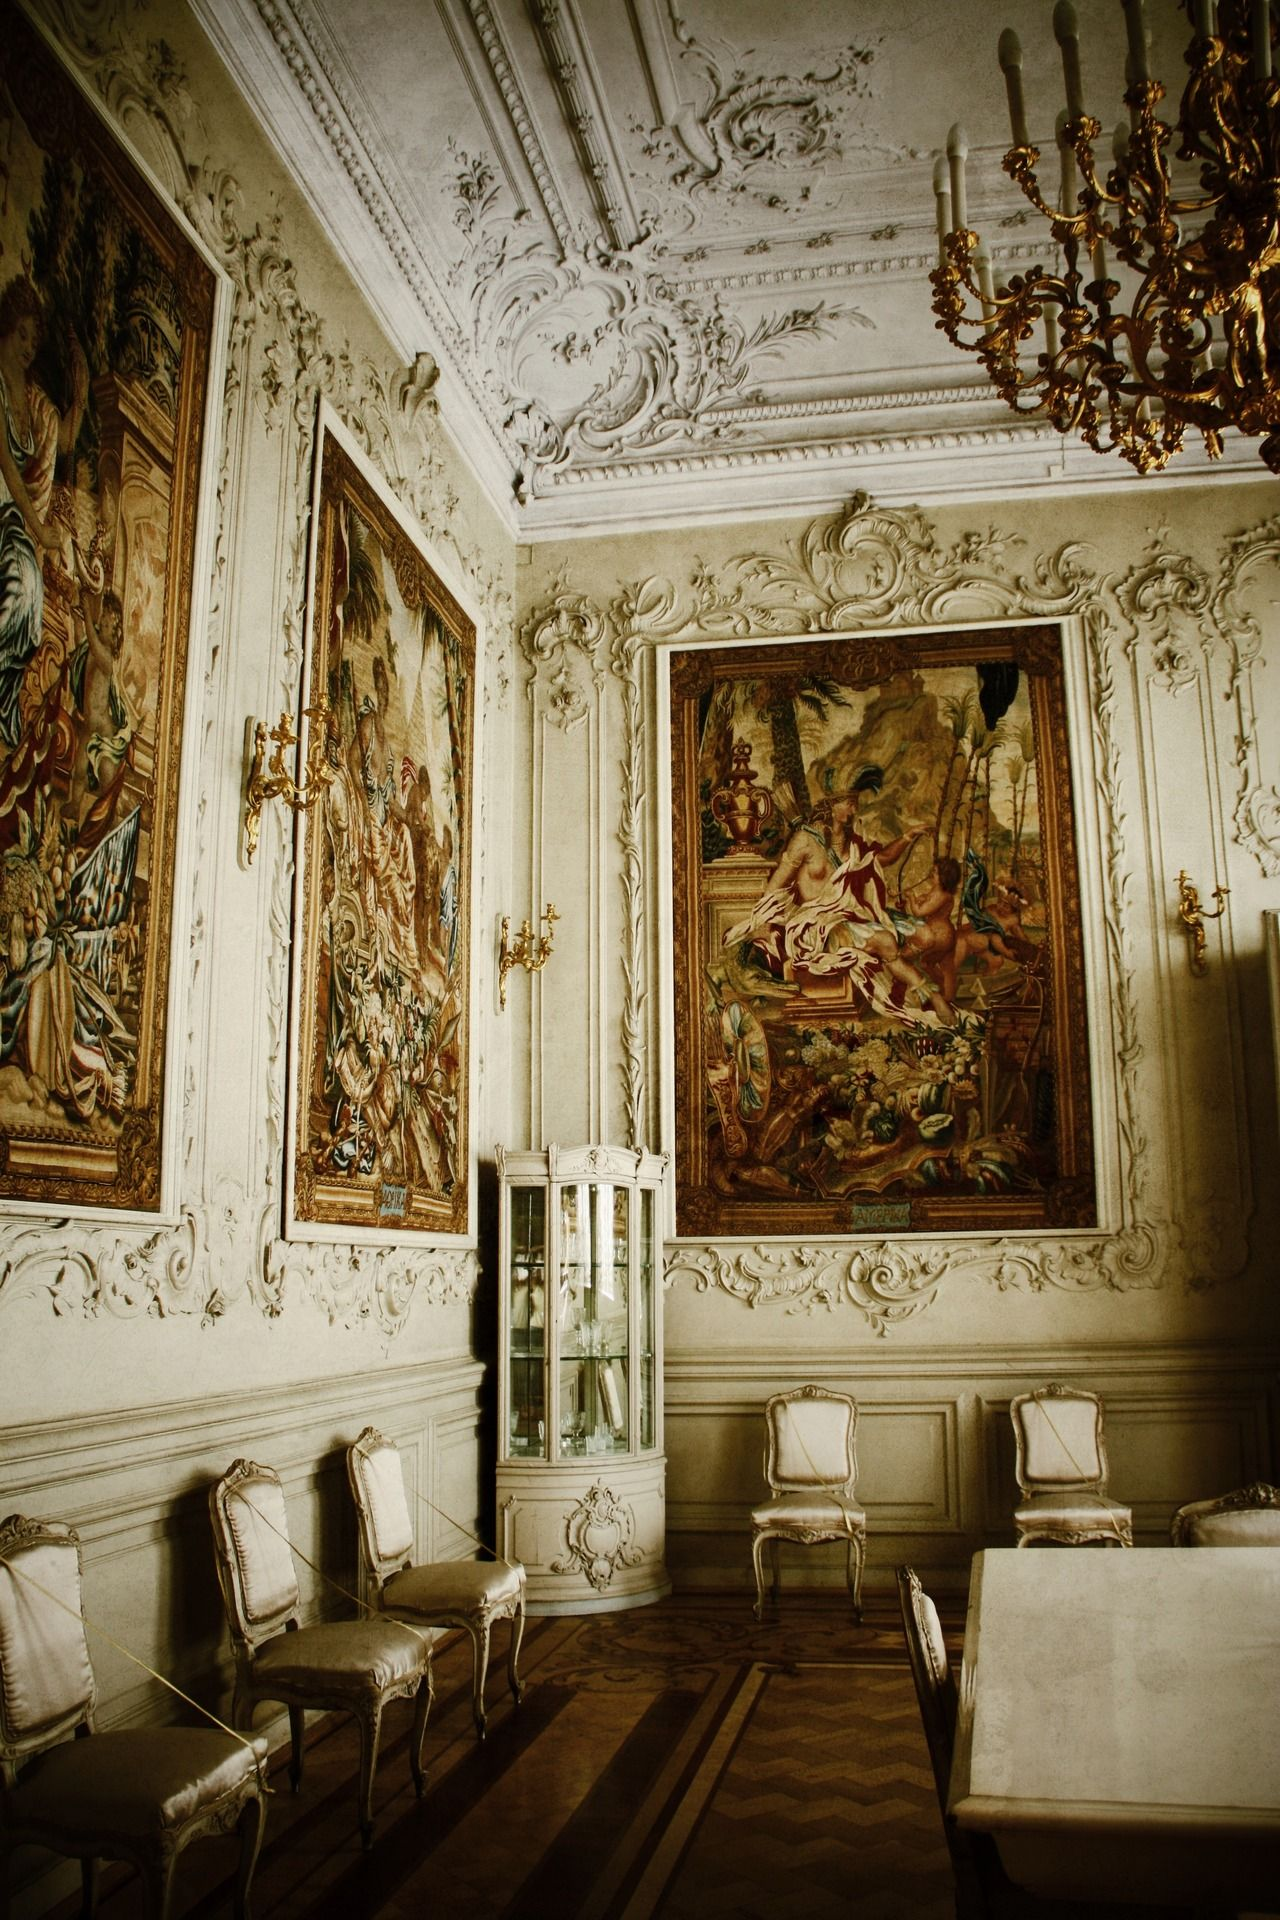 Interiors of Winter Palace Saint Petersburg Russia.